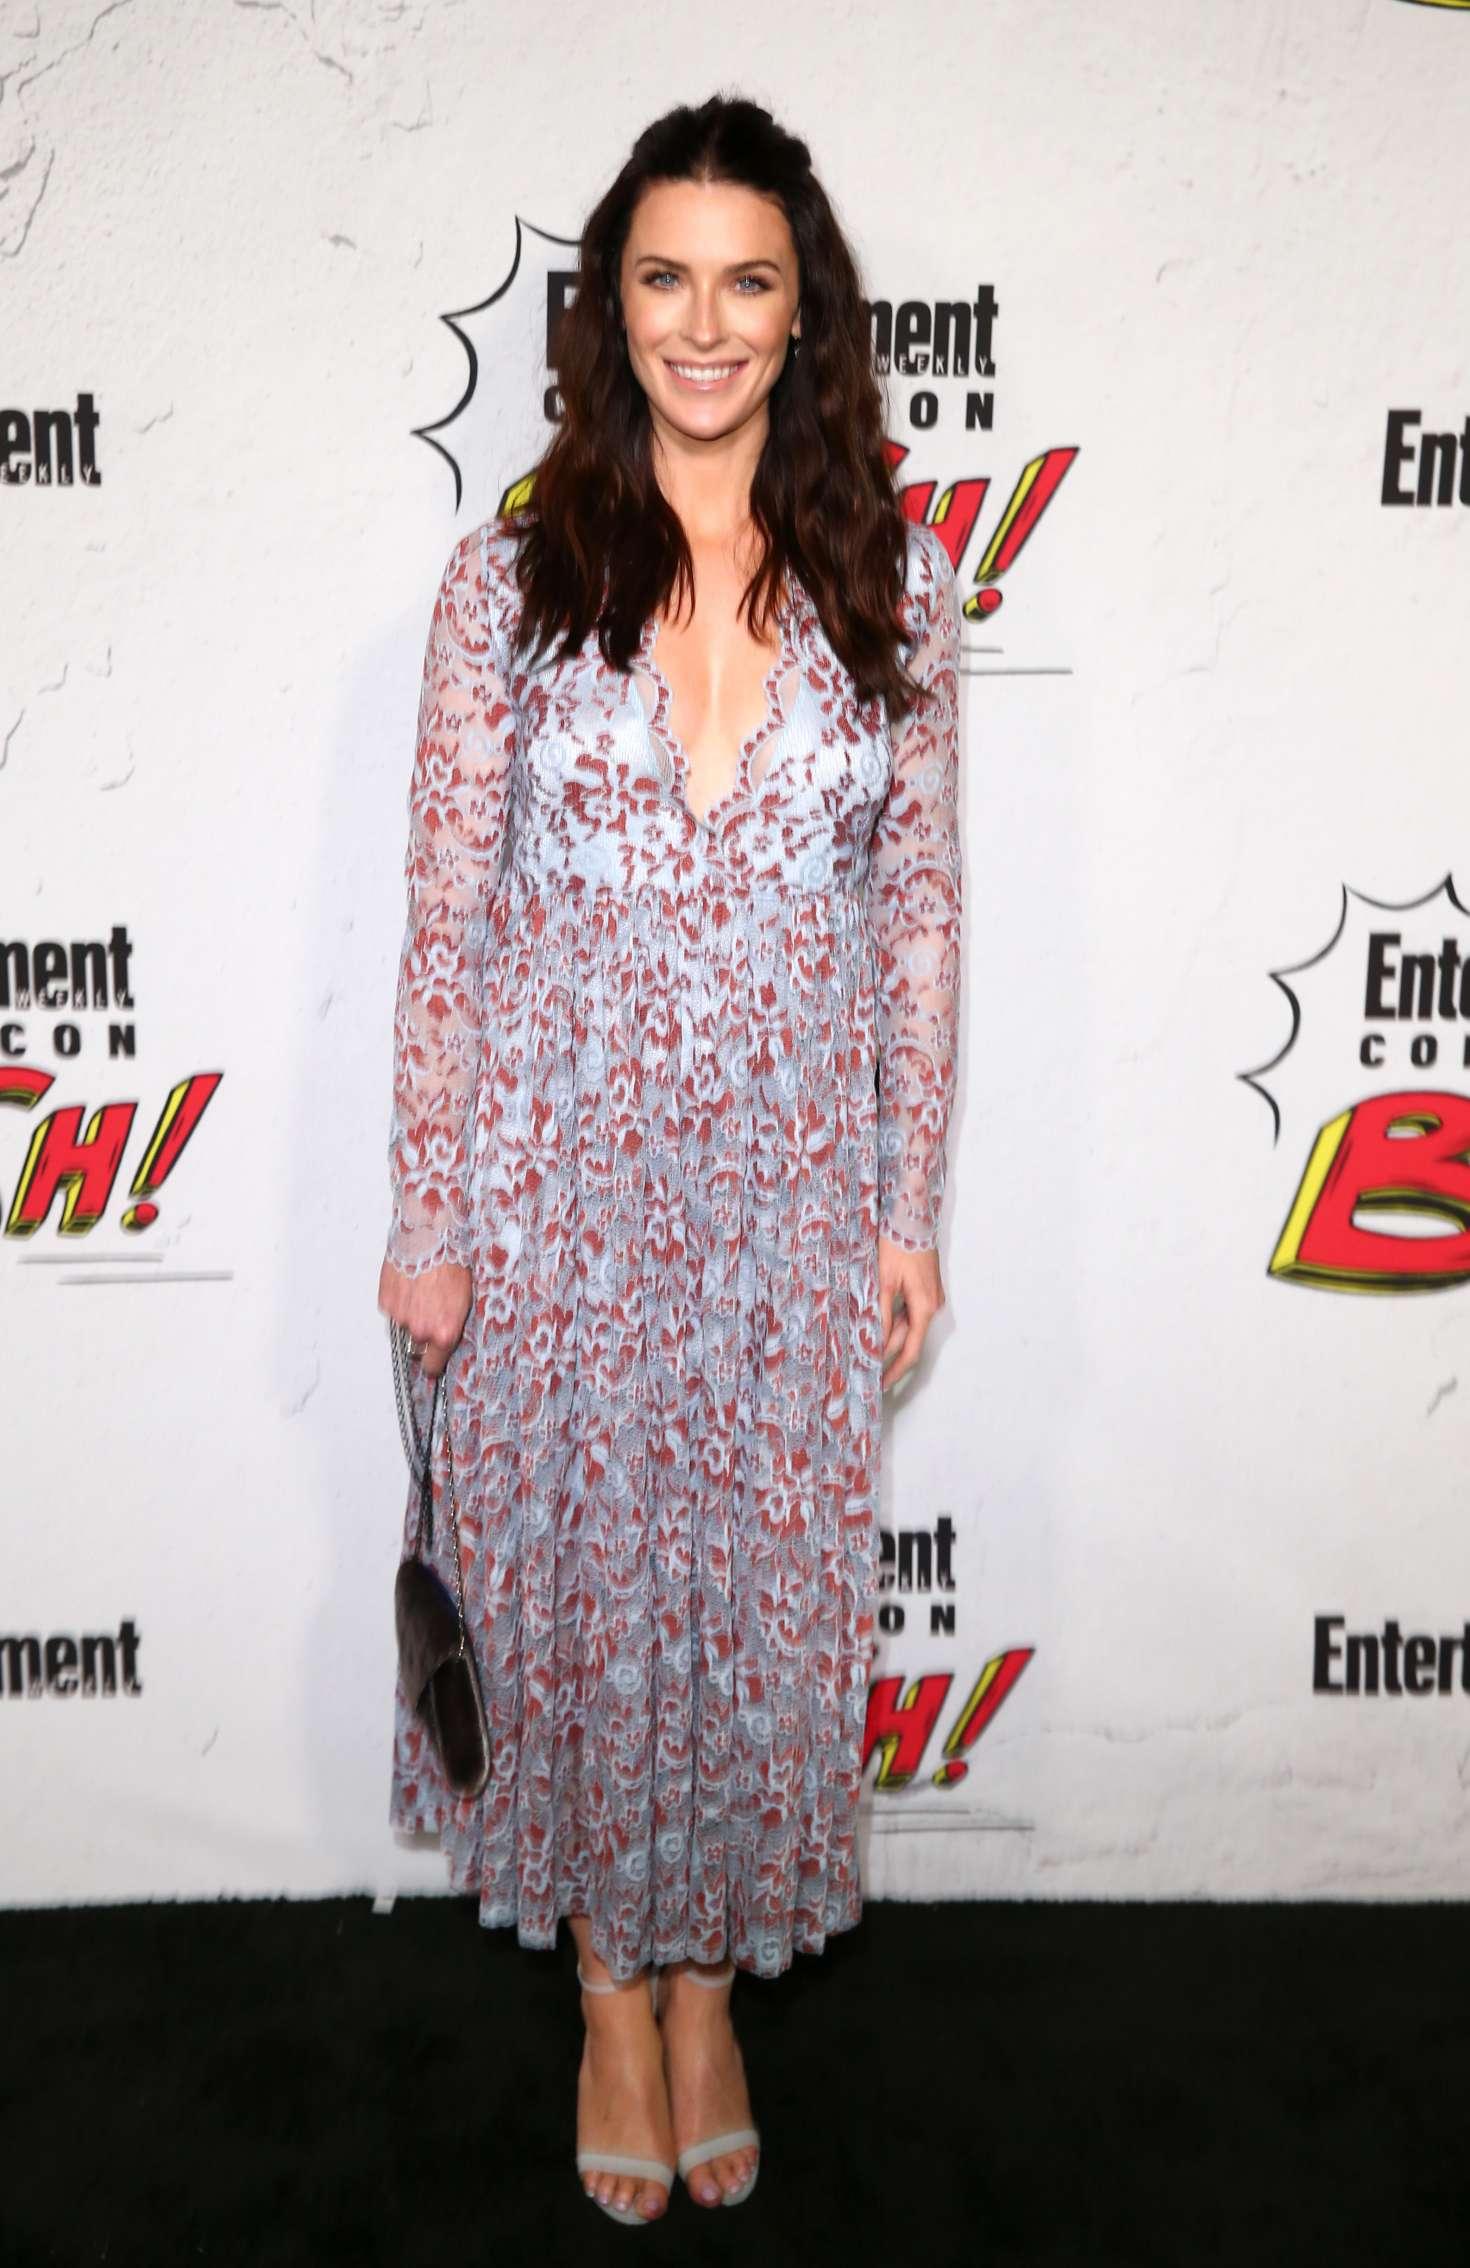 Bridget Regan Entertainment Weekly Party At 2017 Comic Con 02 Full Size